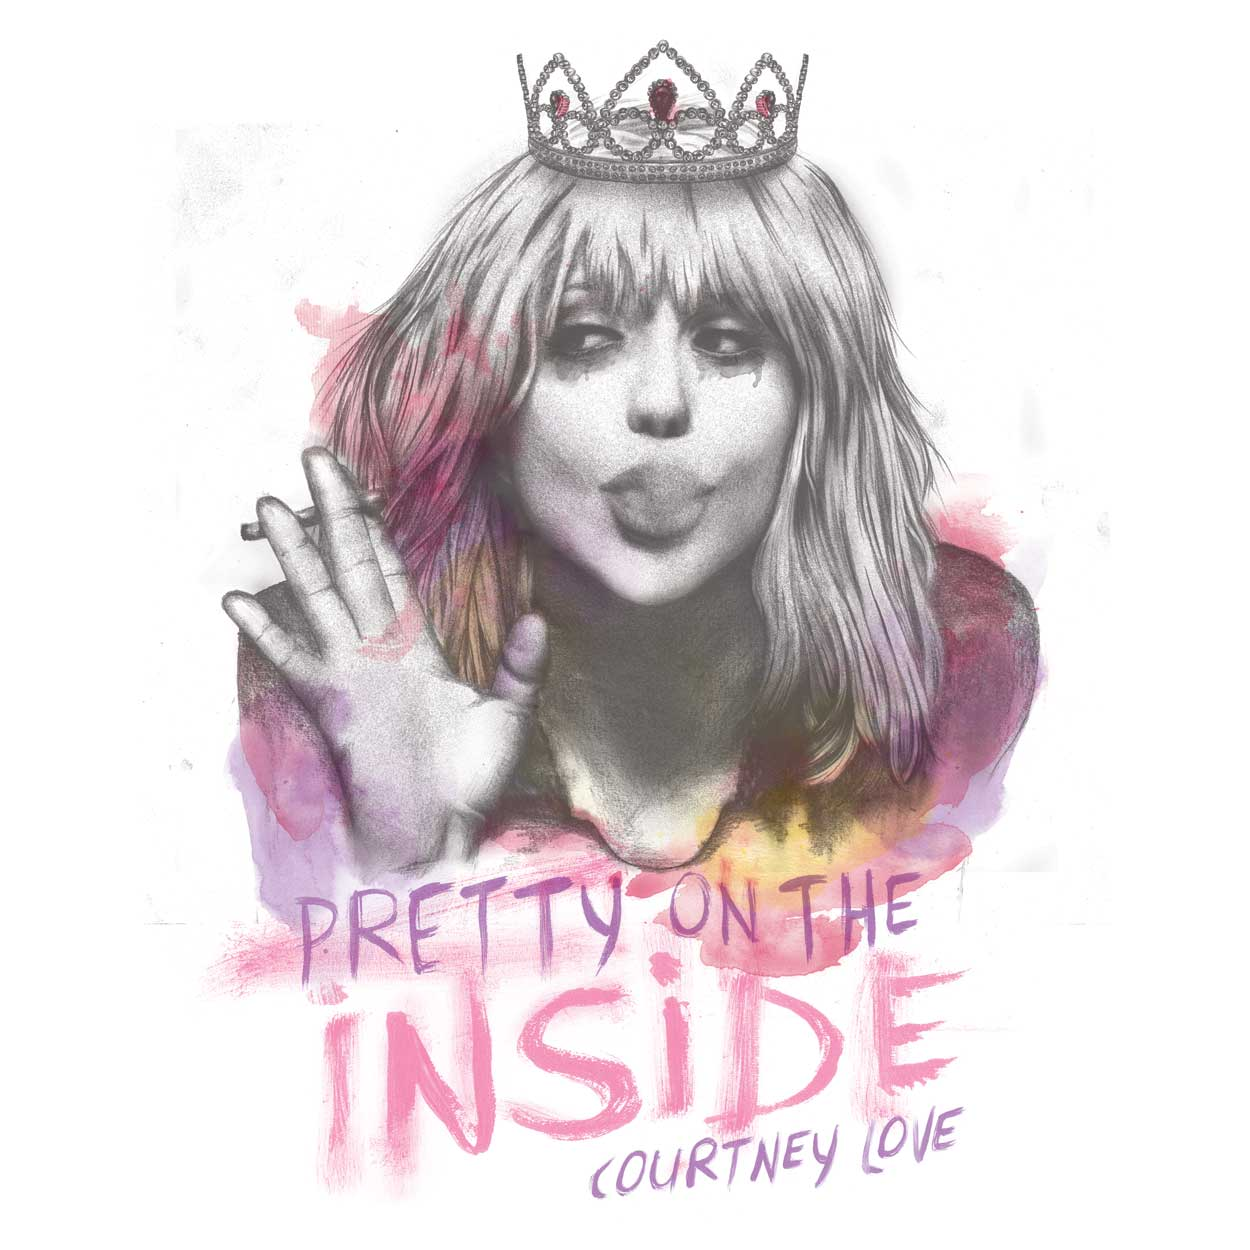 Camiseta - Pretty On The Inside - Courtney Love - Feminino